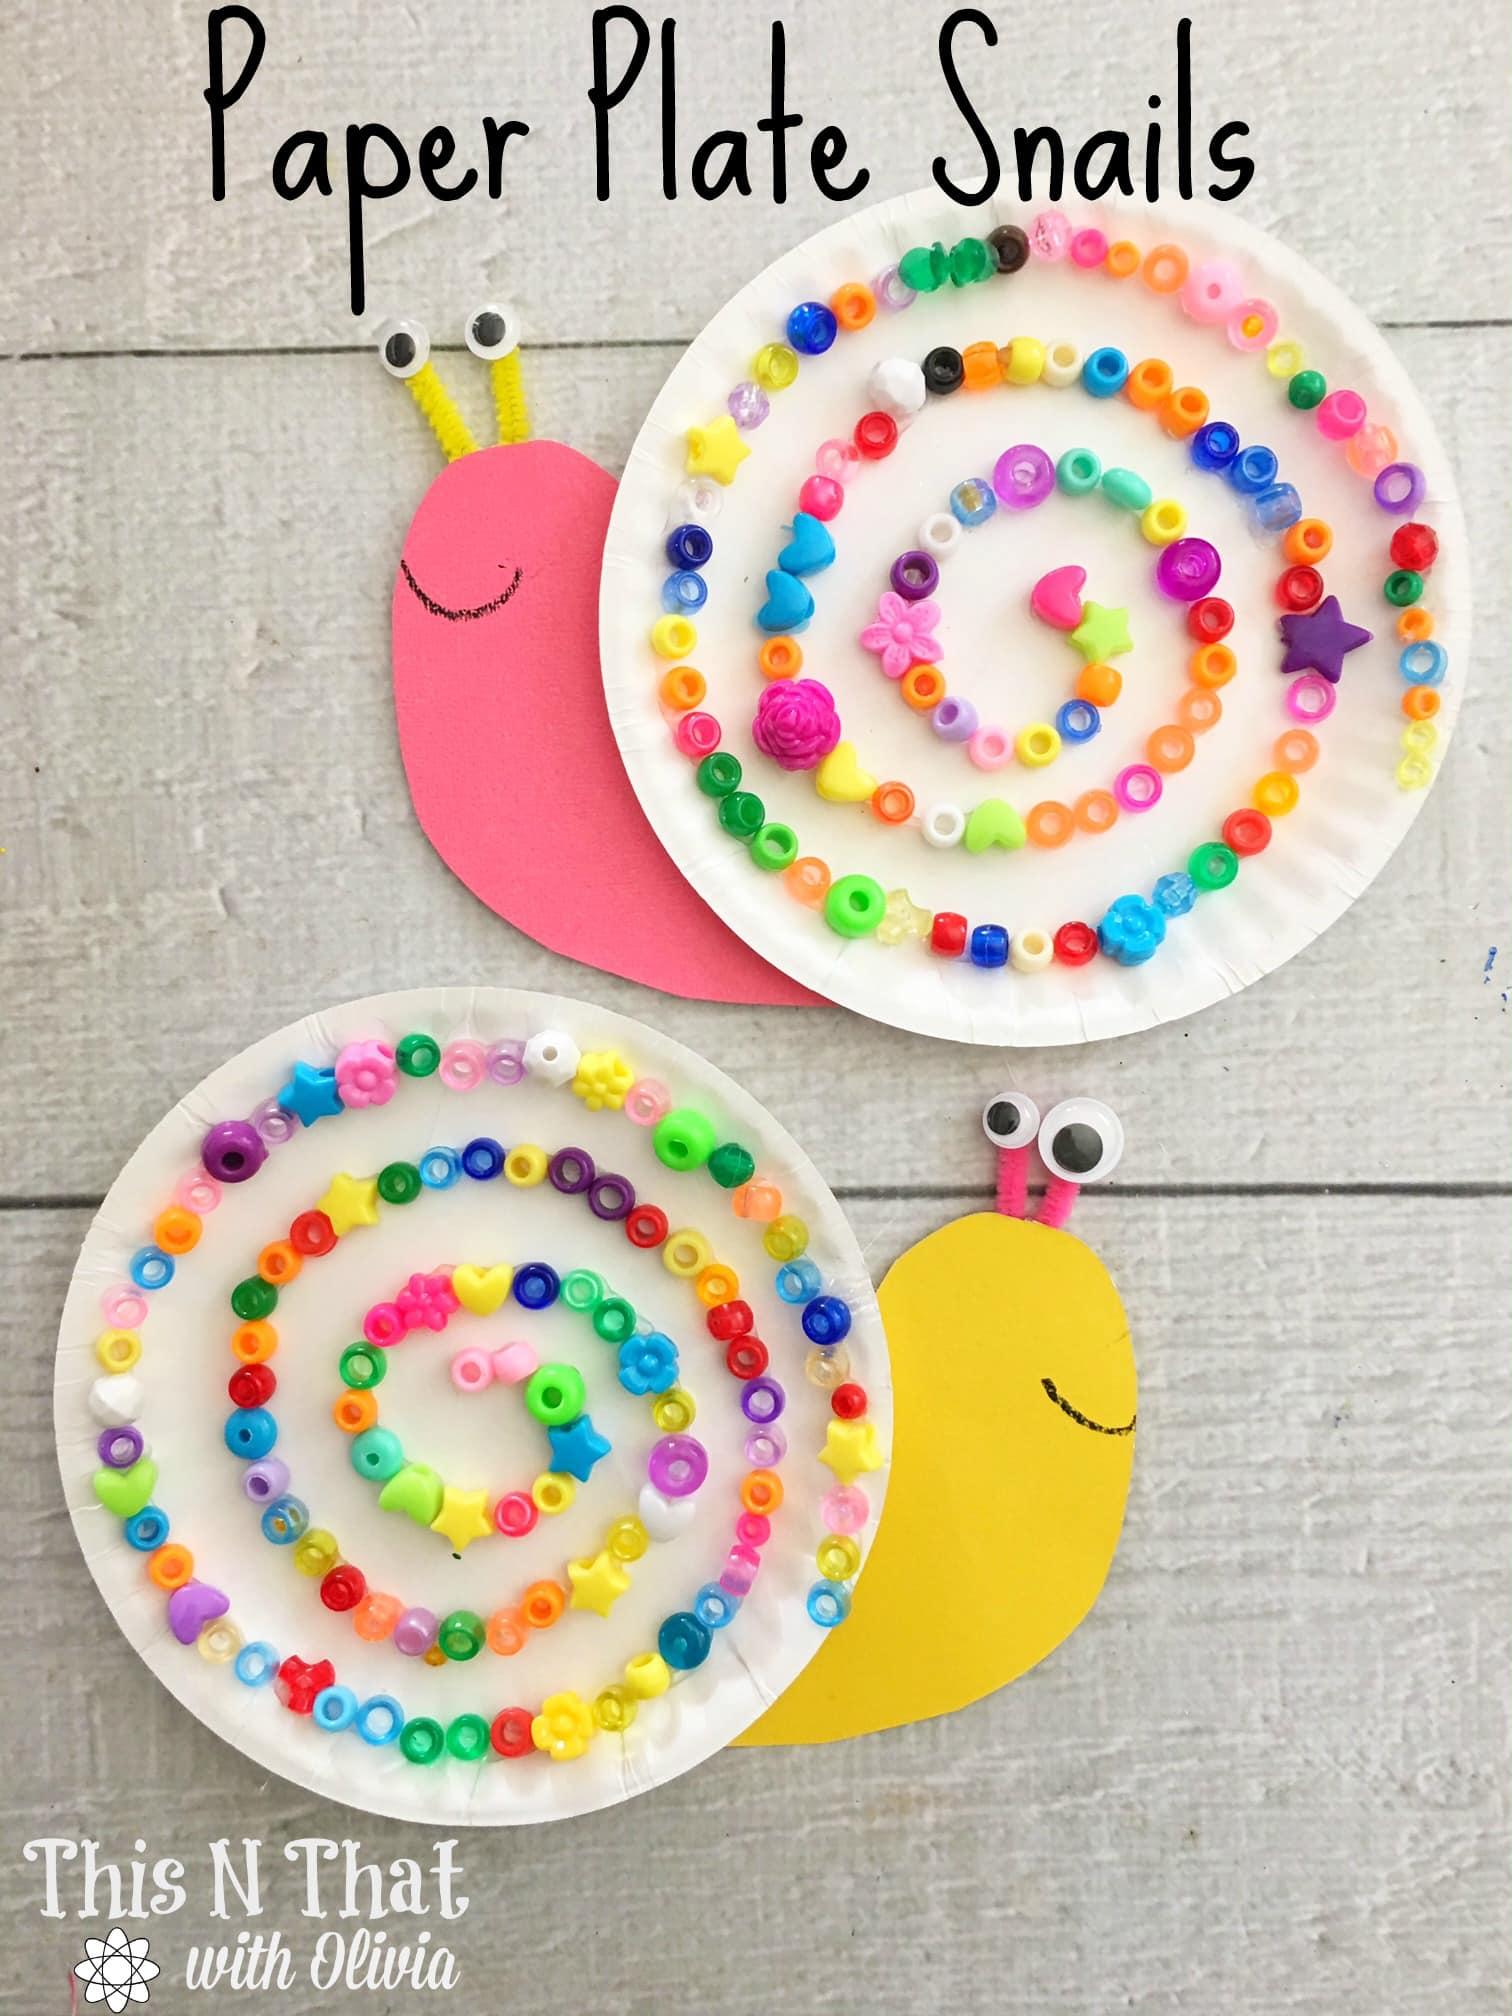 Paper Plate Snails Craft #Snail #Craft #DIY #Kids